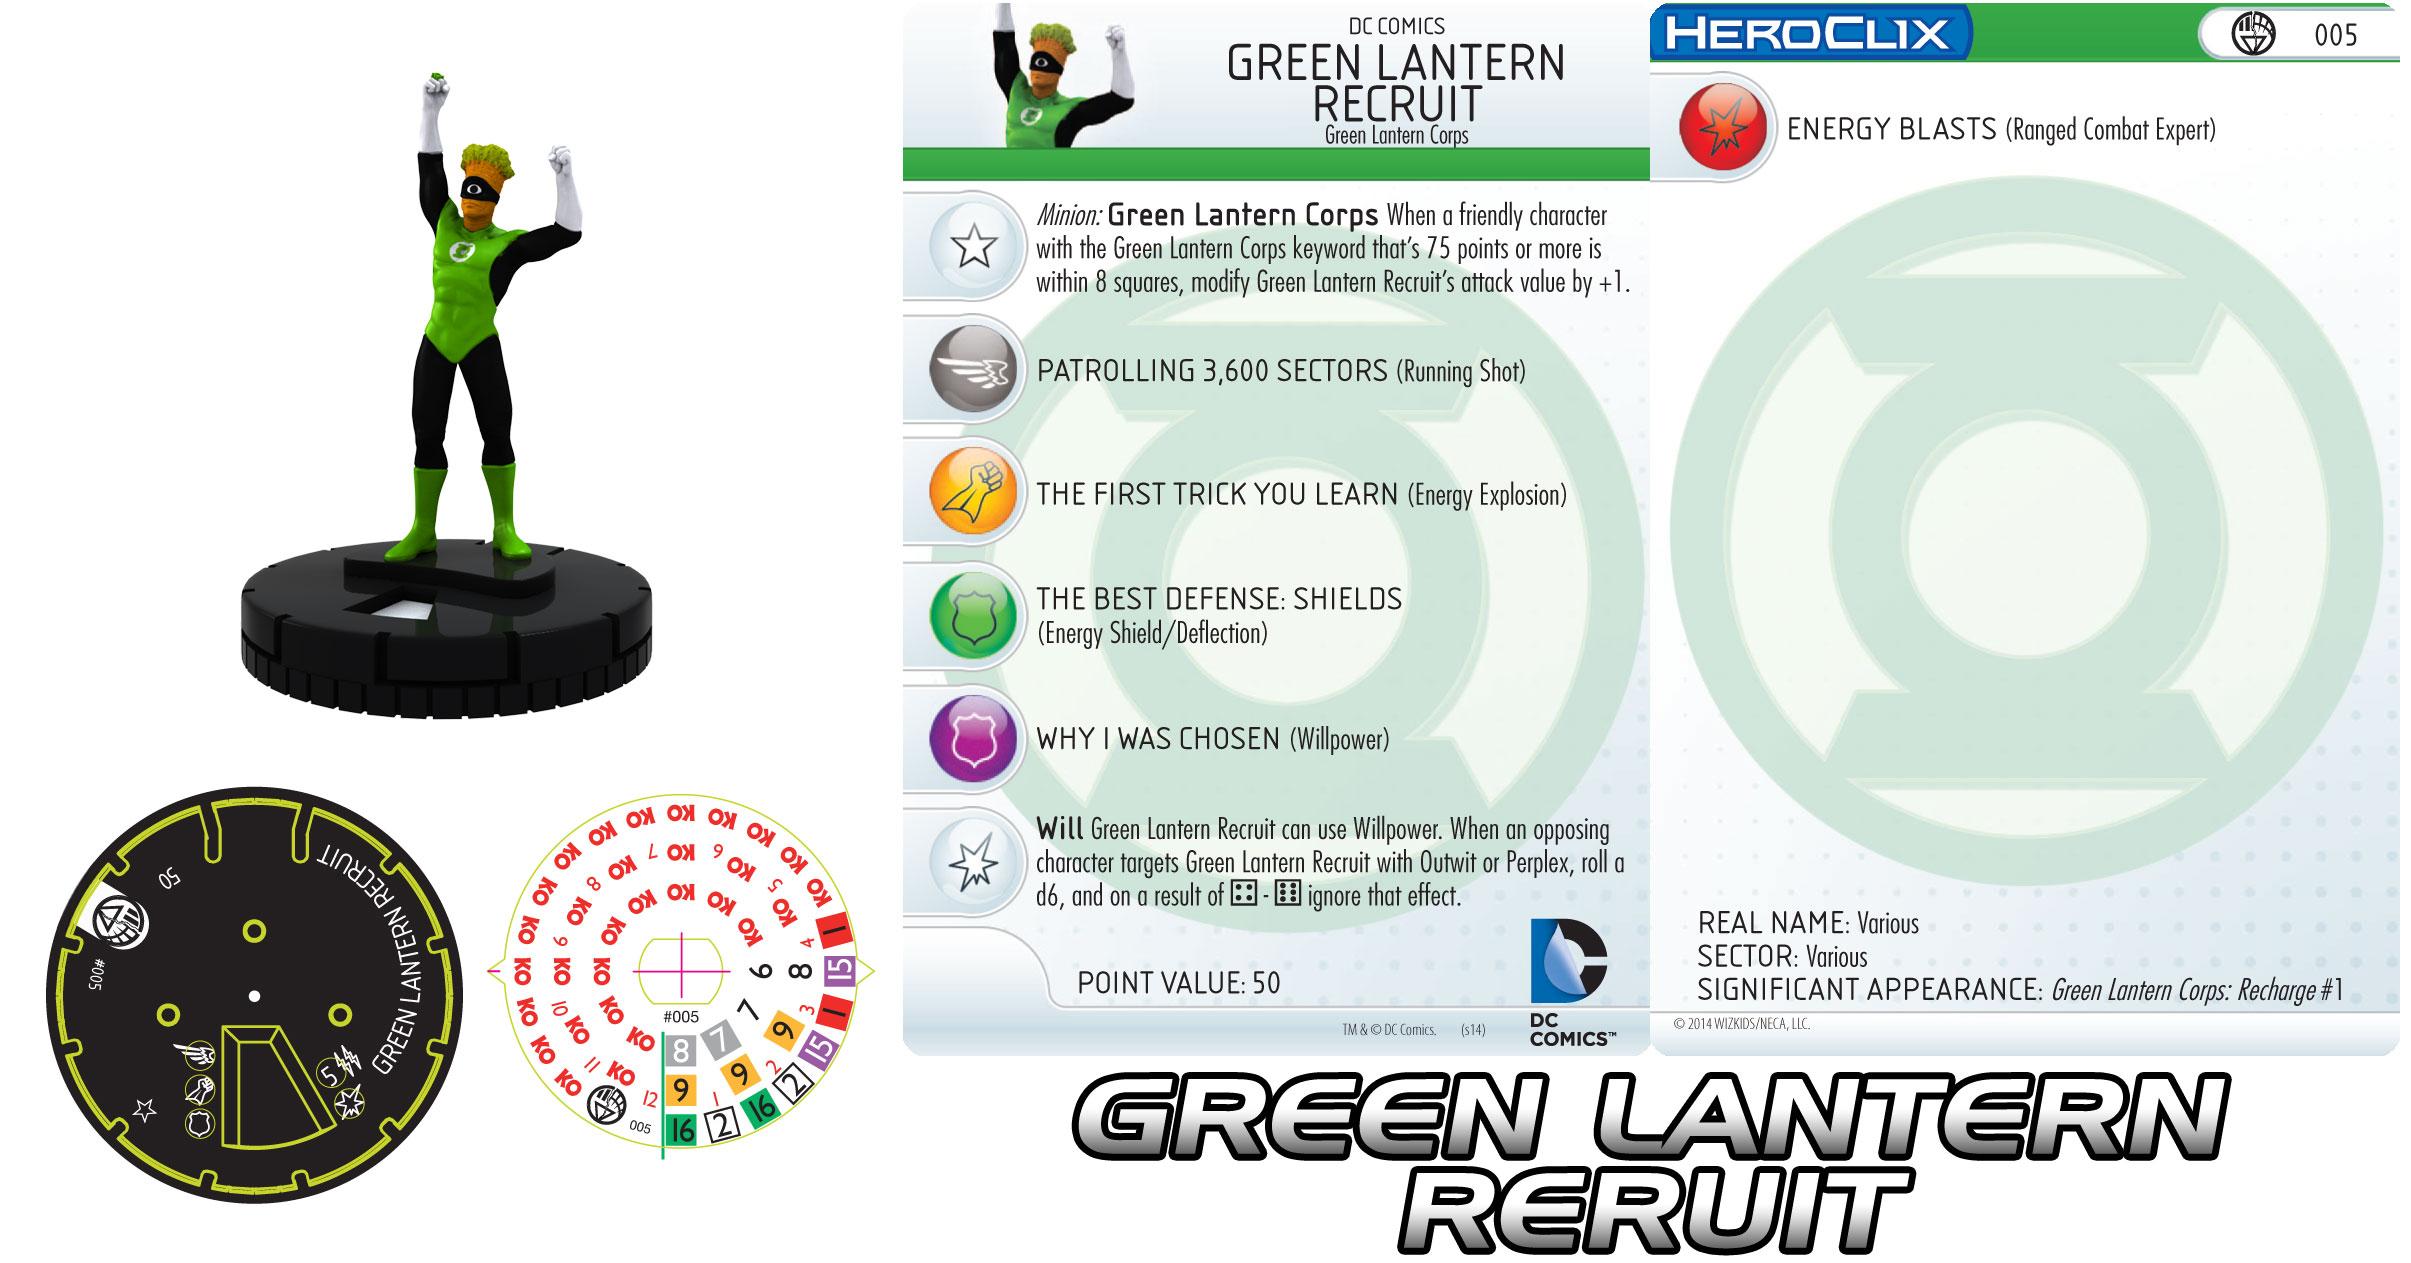 Green Lantern recruit Heroclix figure